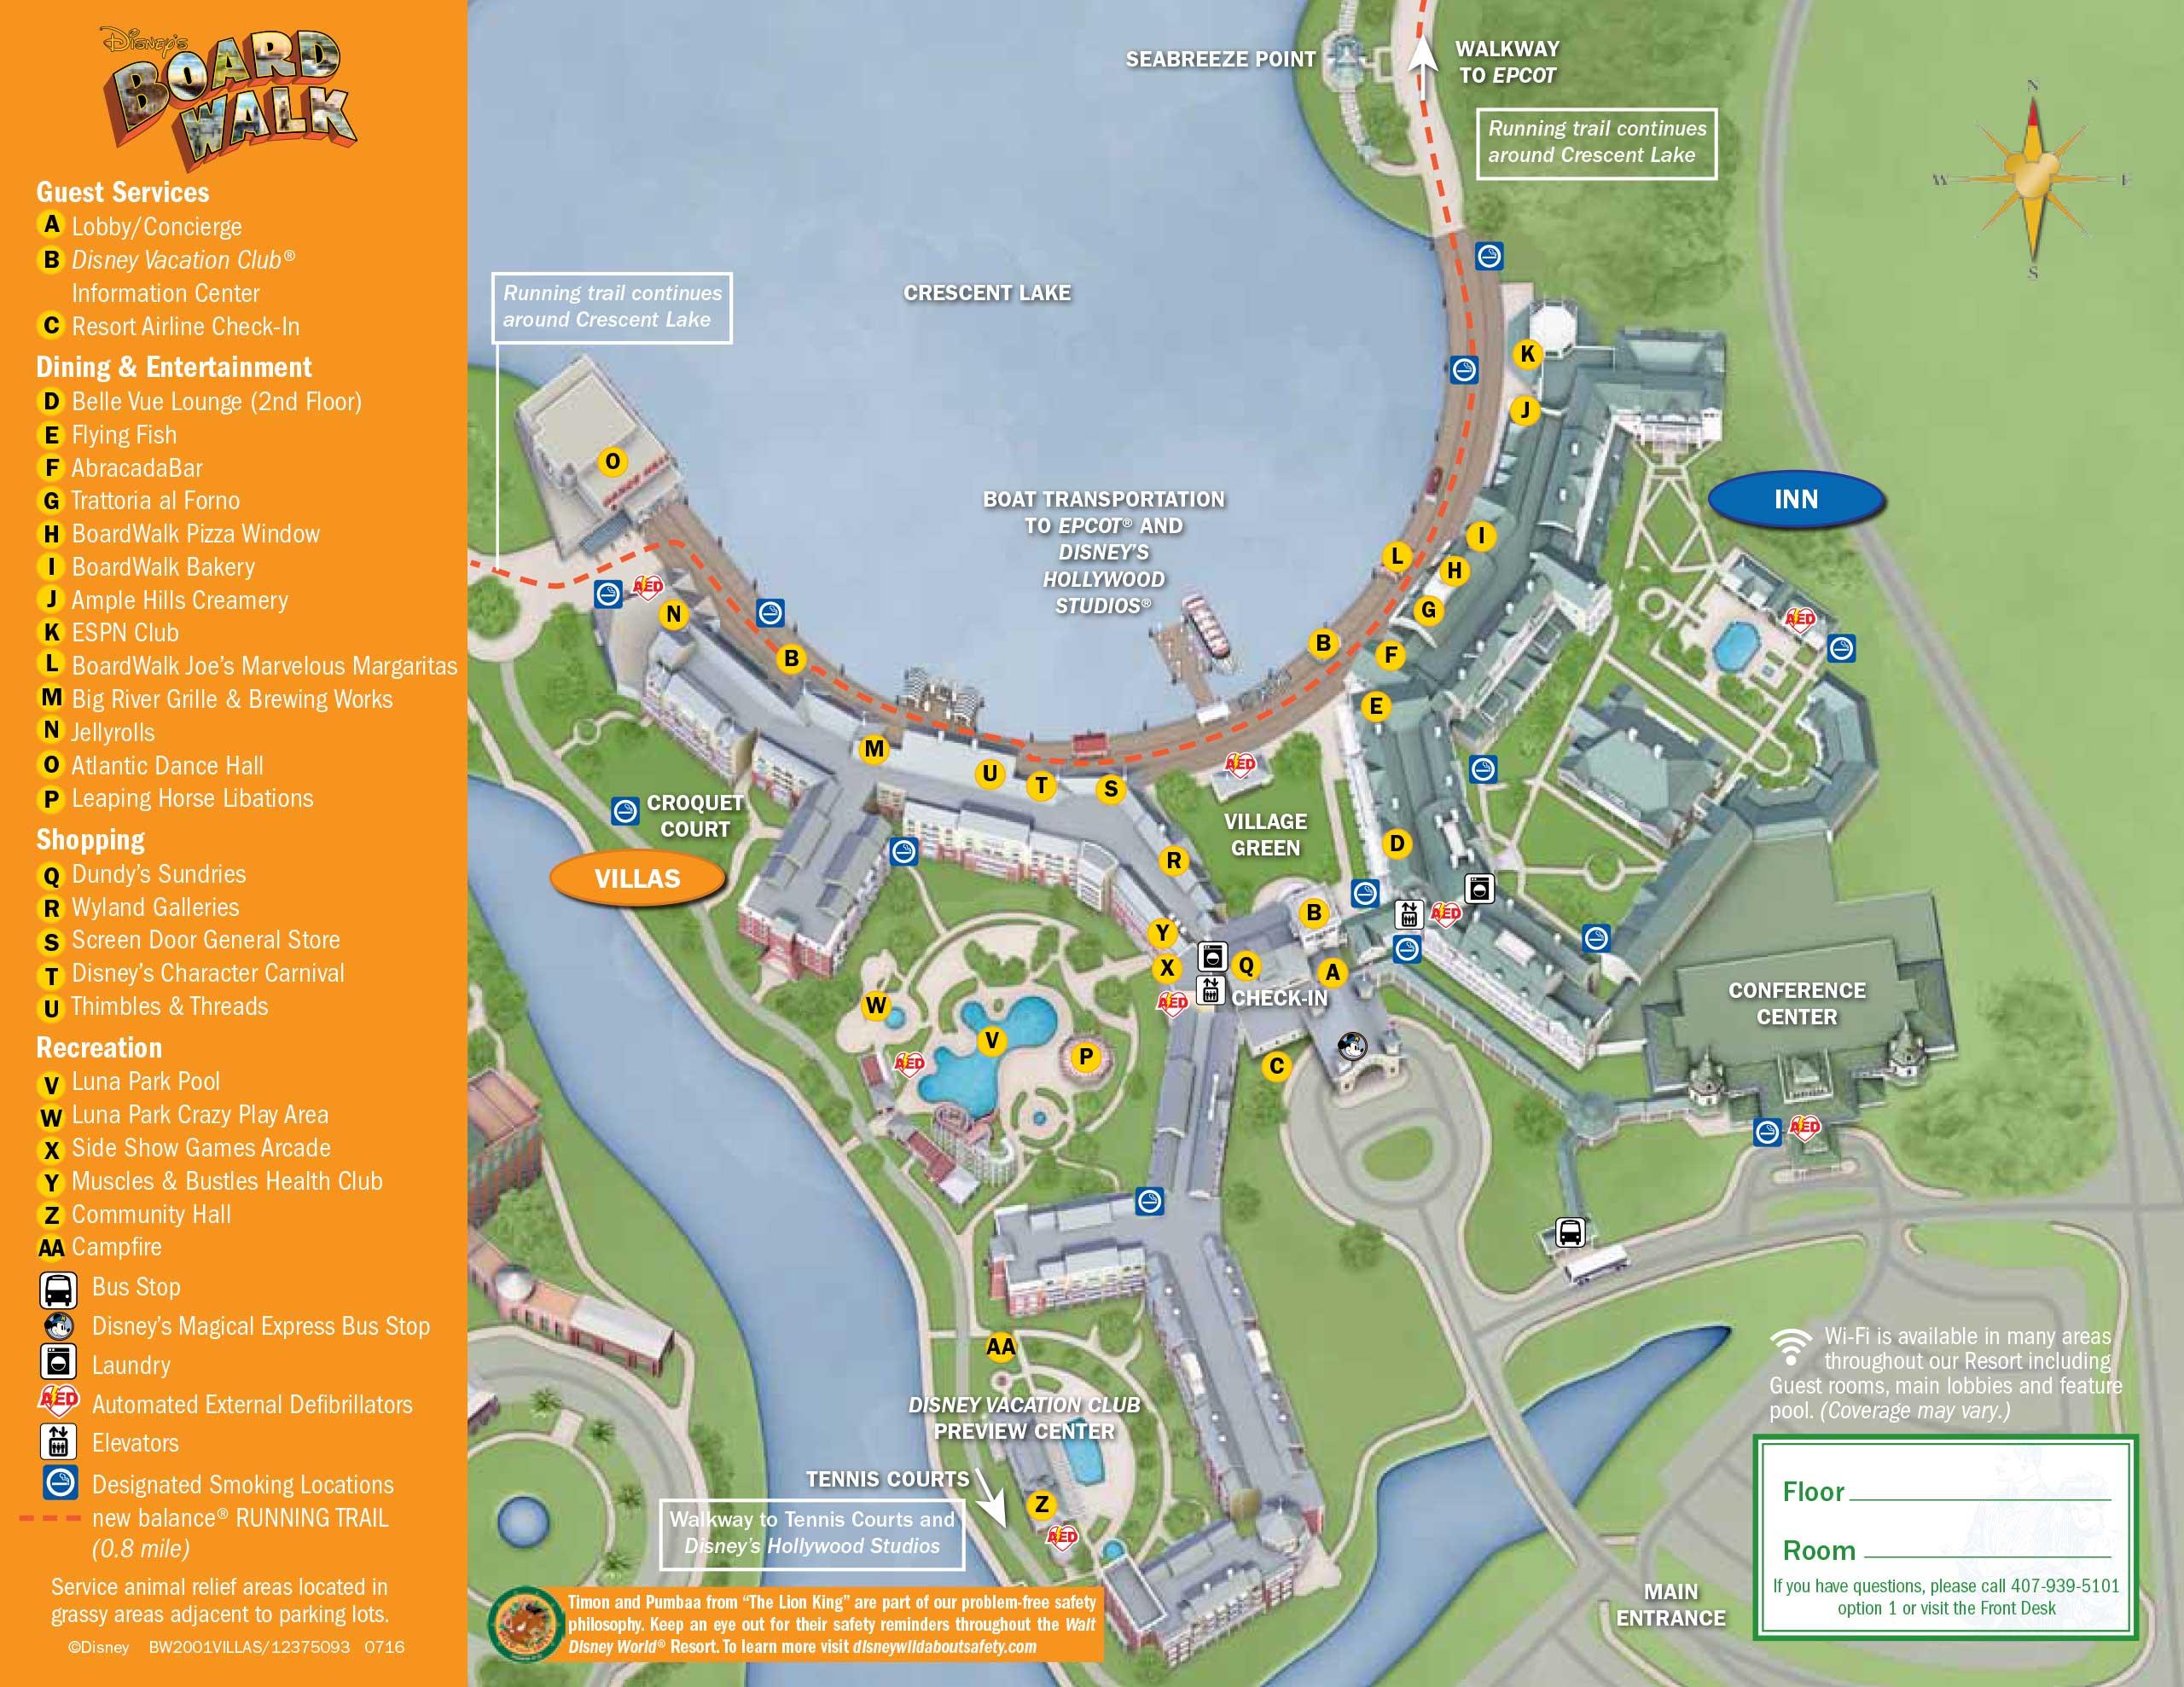 April 2017 Walt Disney World Resort Hotel Maps Photo 18 Of 33: Disney World Hotels Map At Slyspyder.com